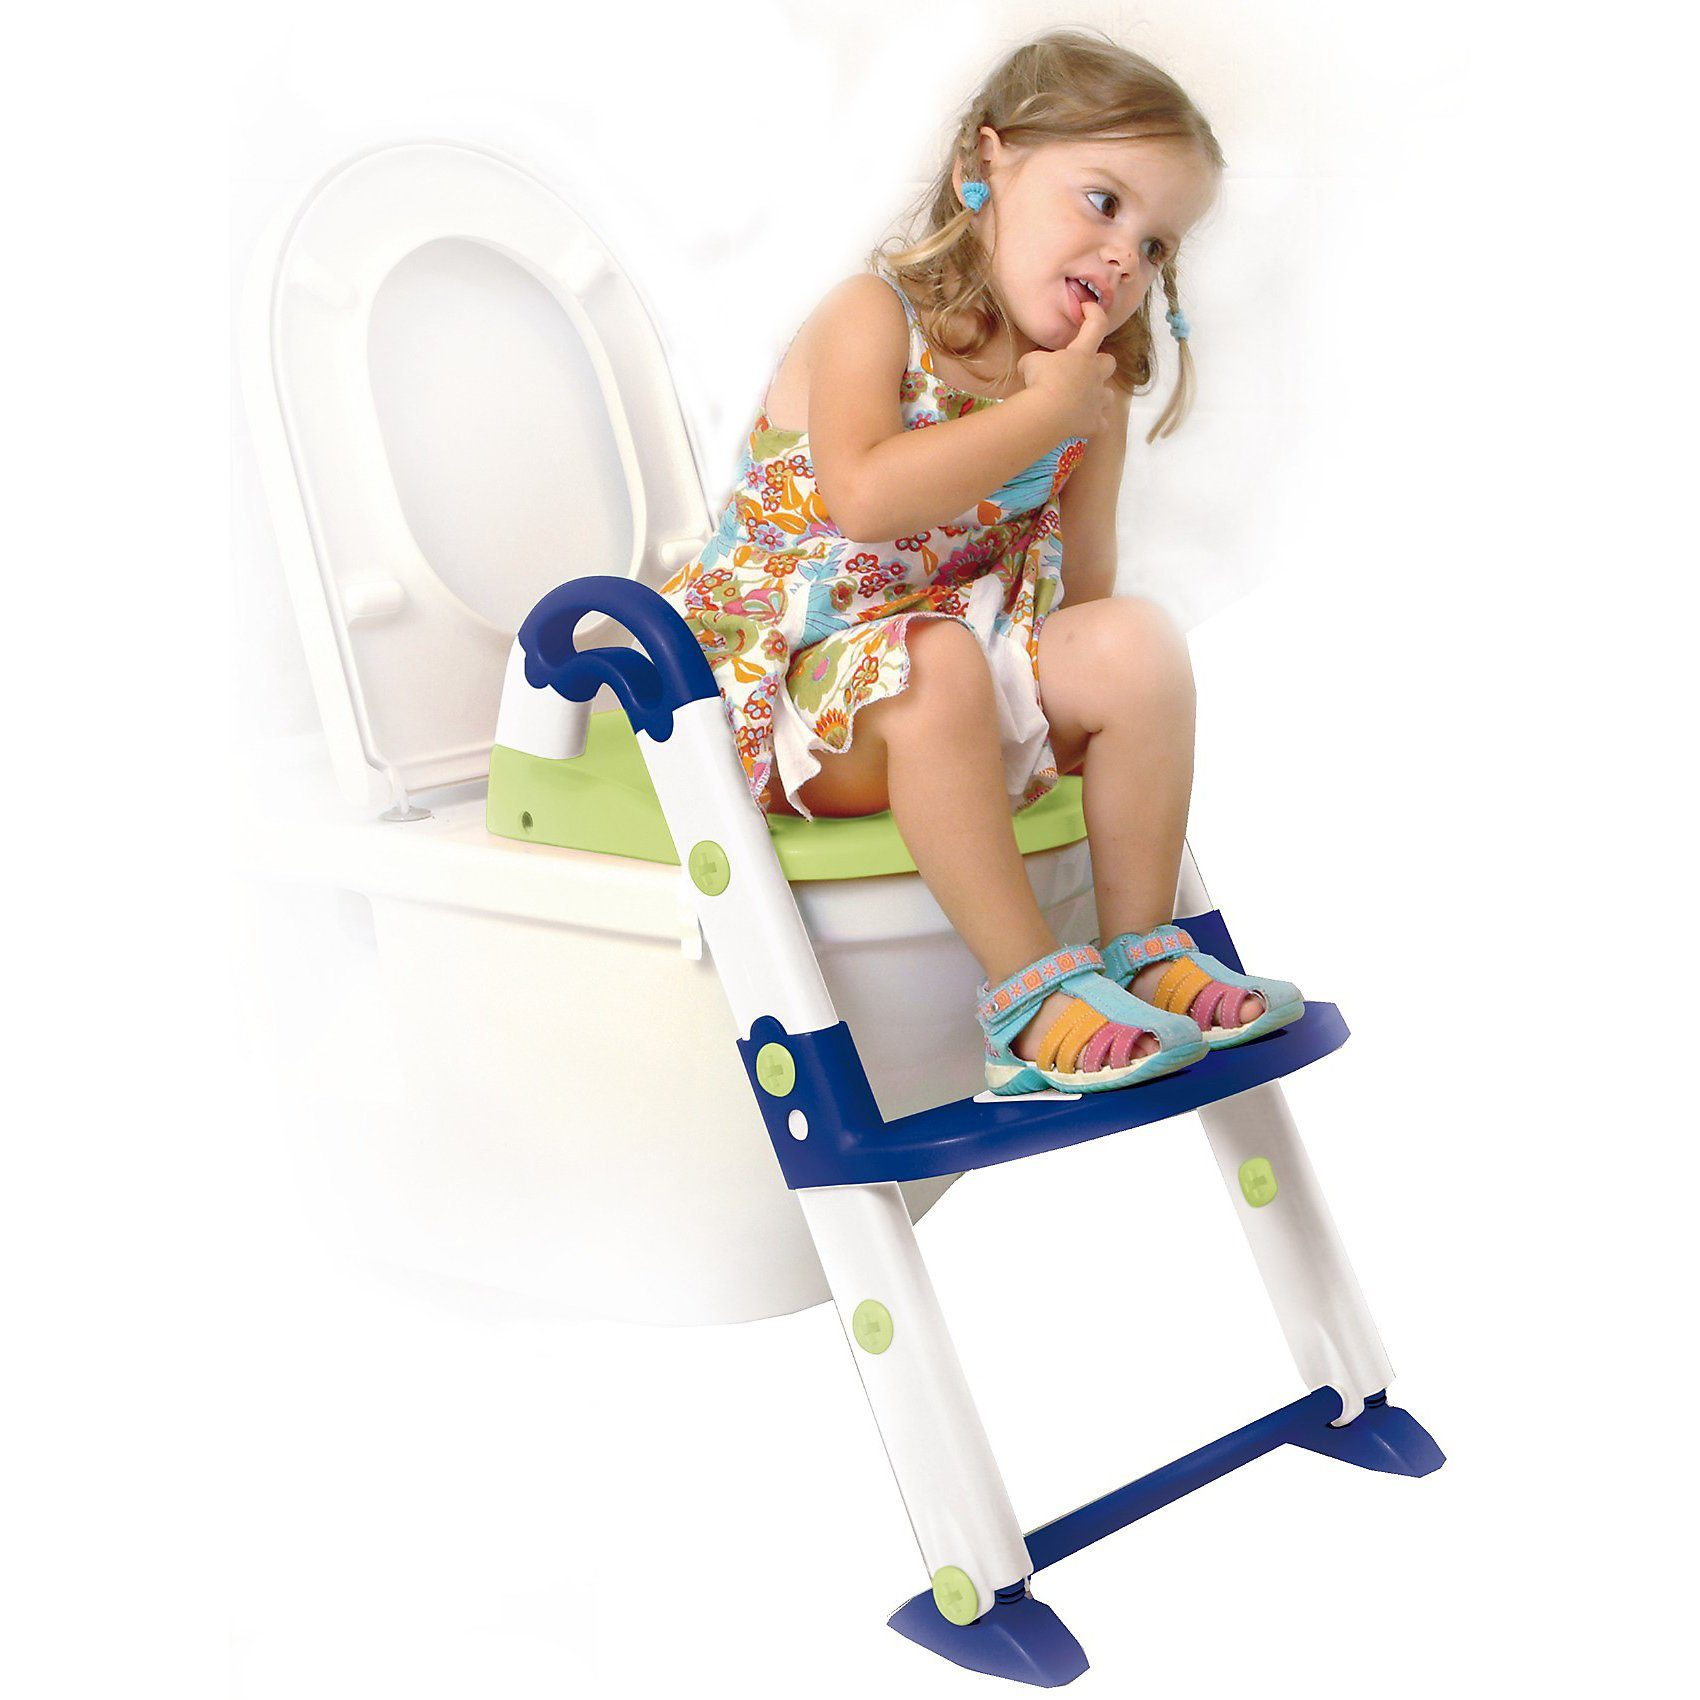 KidsKit Toilettentrainer 3 in 1, blau / weiß / lindgrün